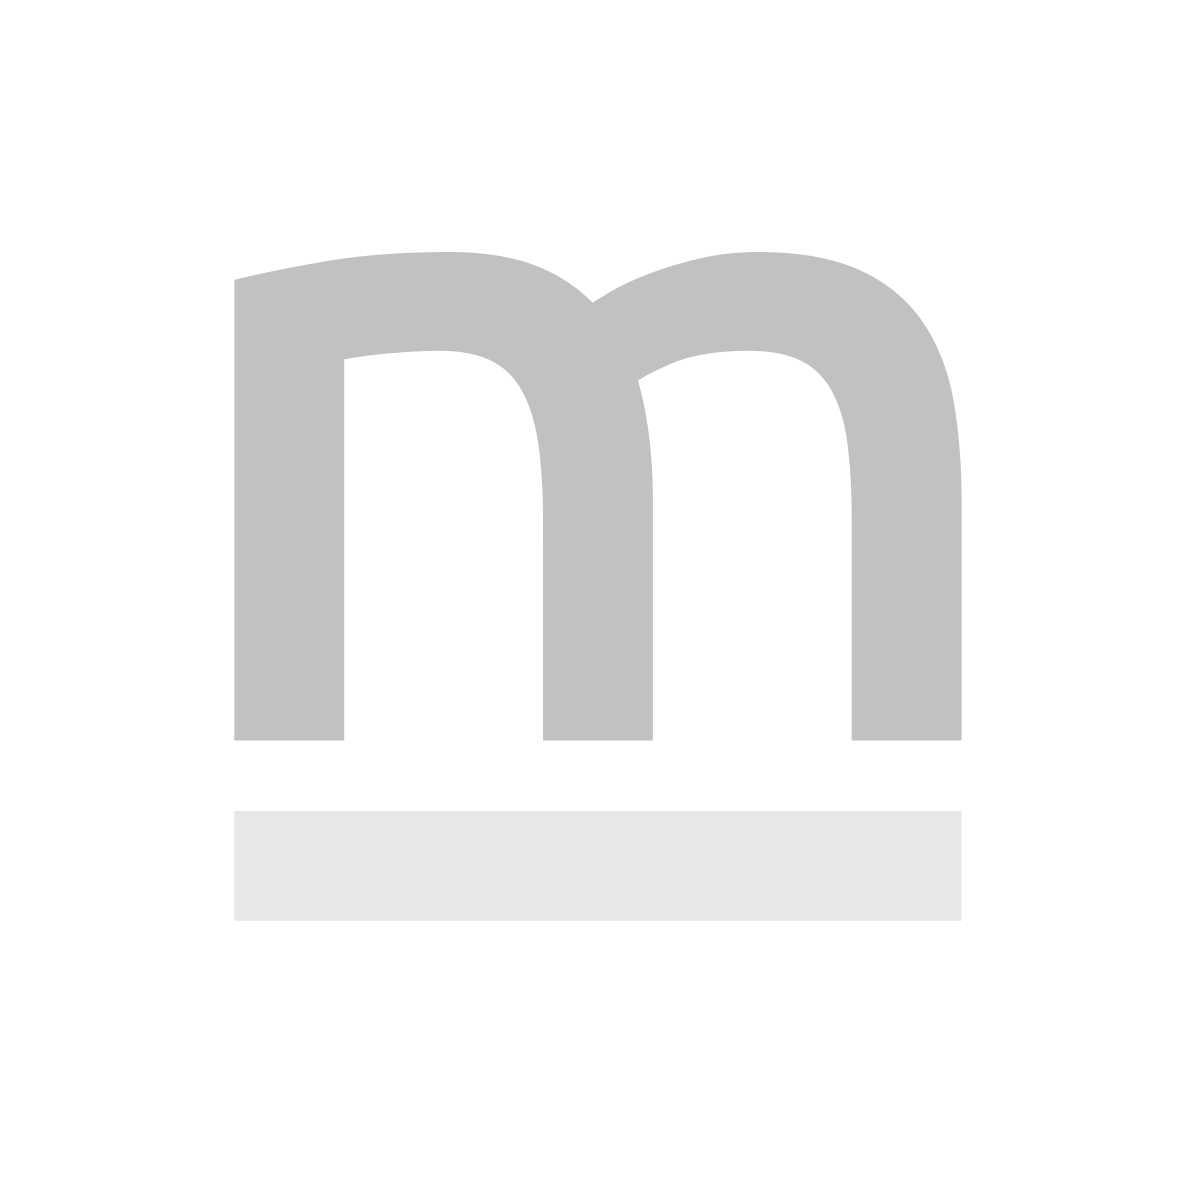 Parawan 3-częściowy - Zainspirowane lasem [Room Dividers]